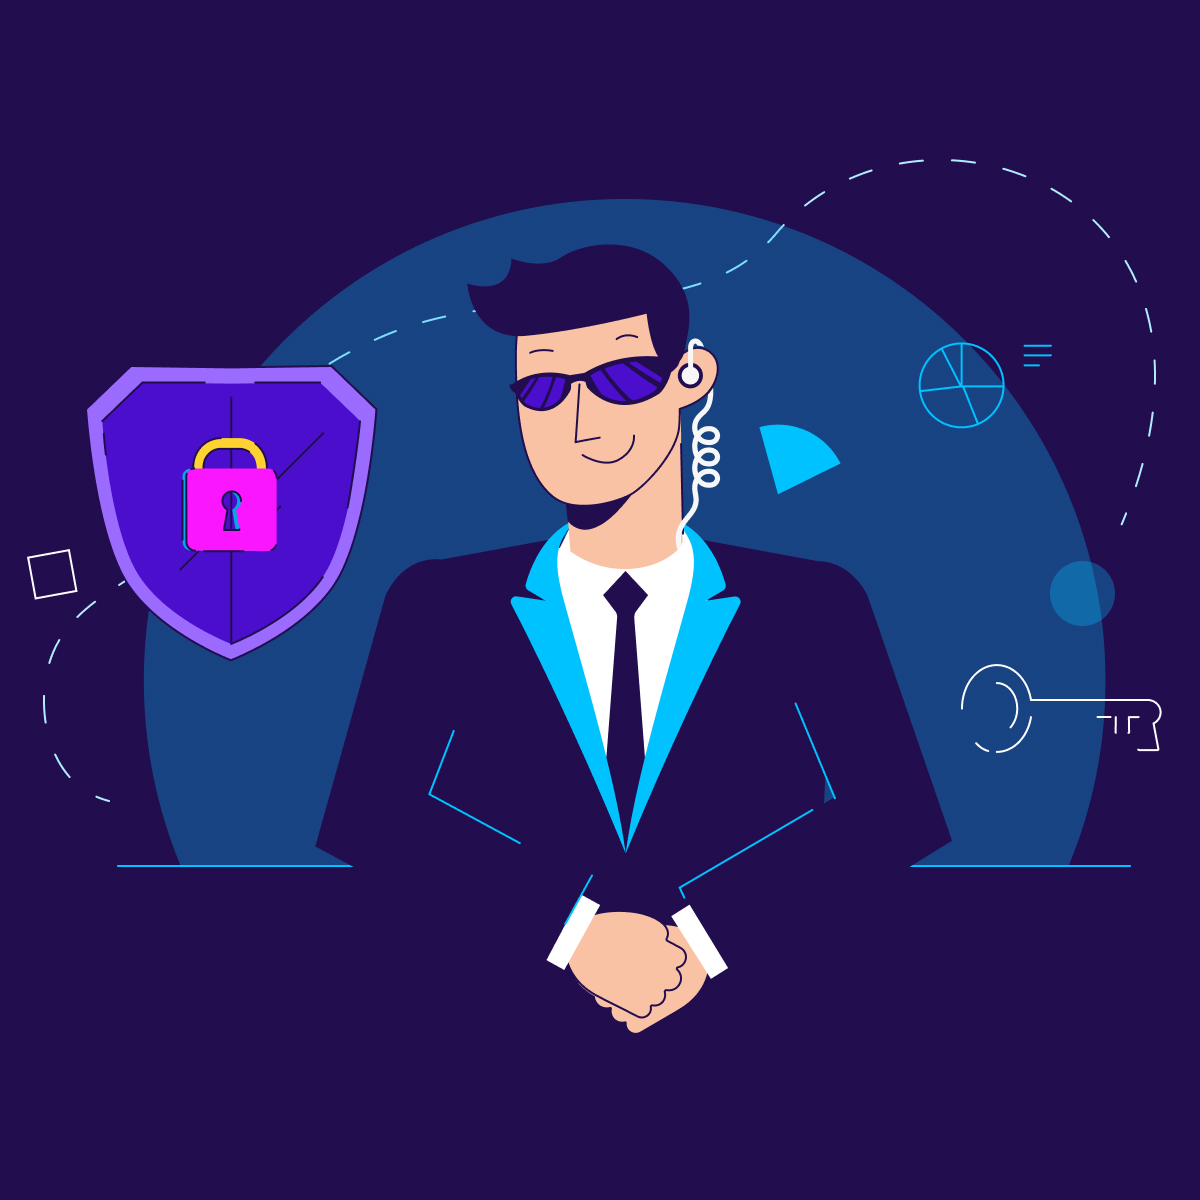 solving authentication authorization - Square